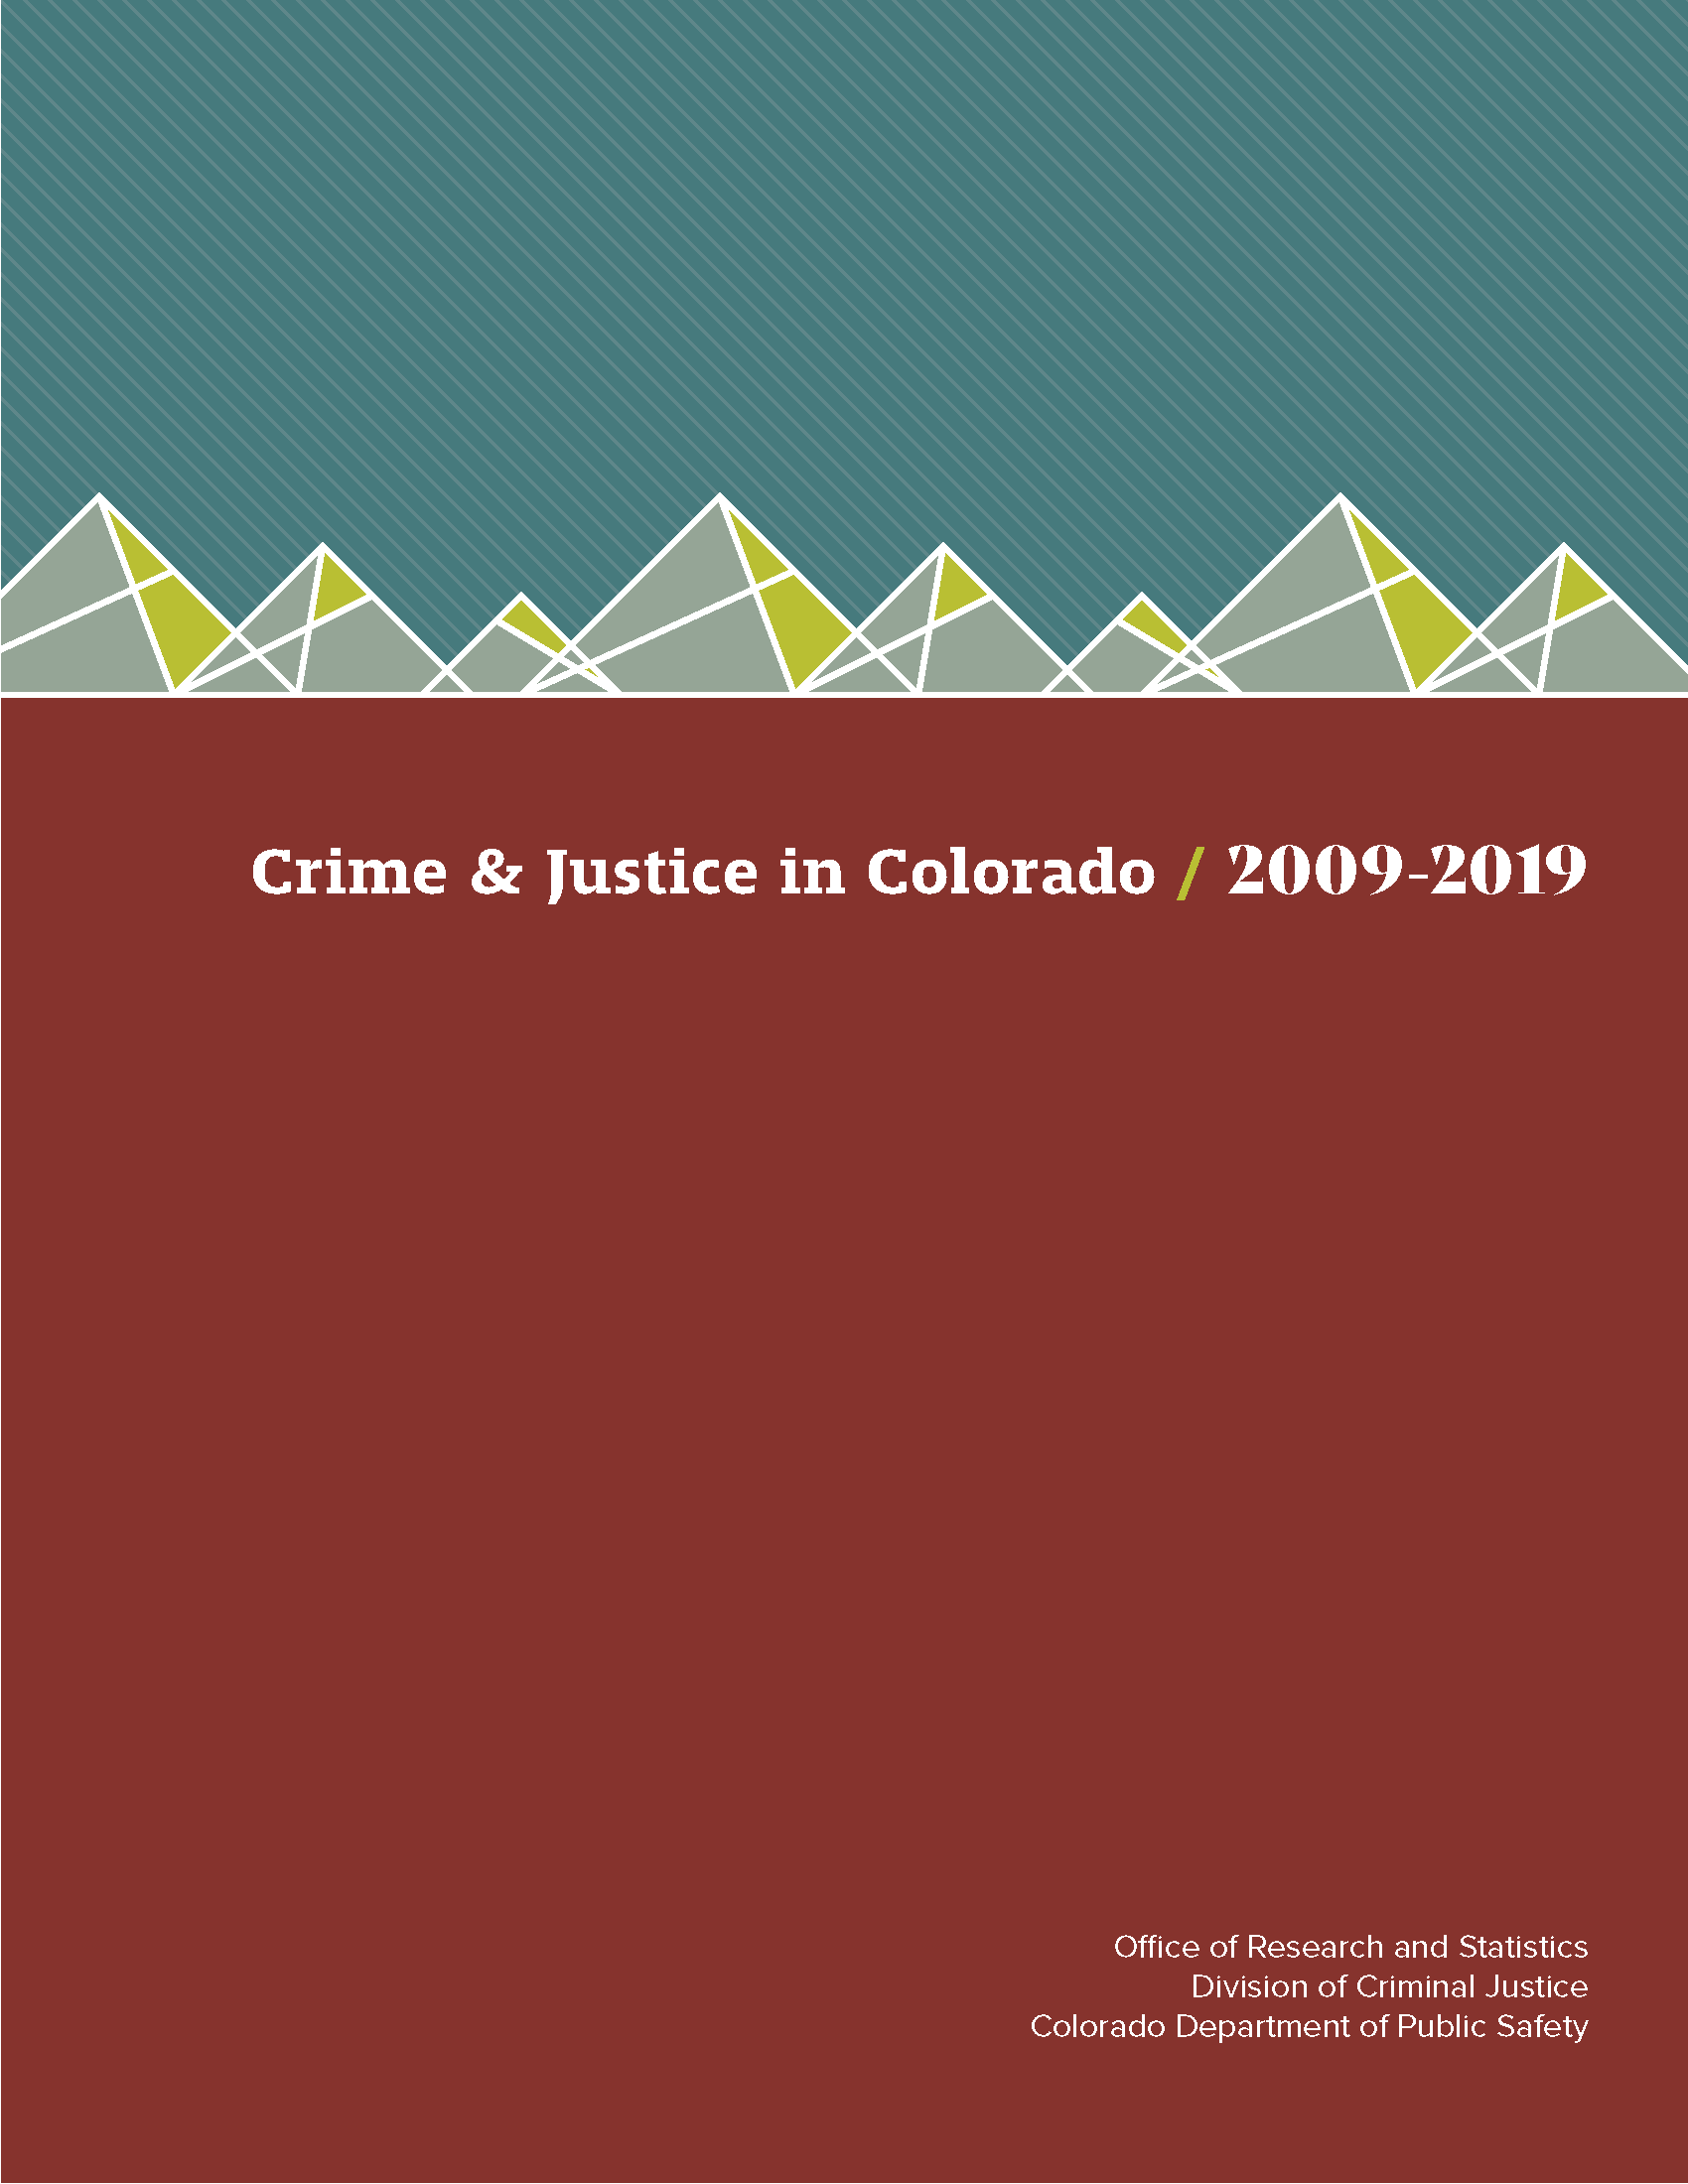 Crime and Justice in Colorado 2009-2019